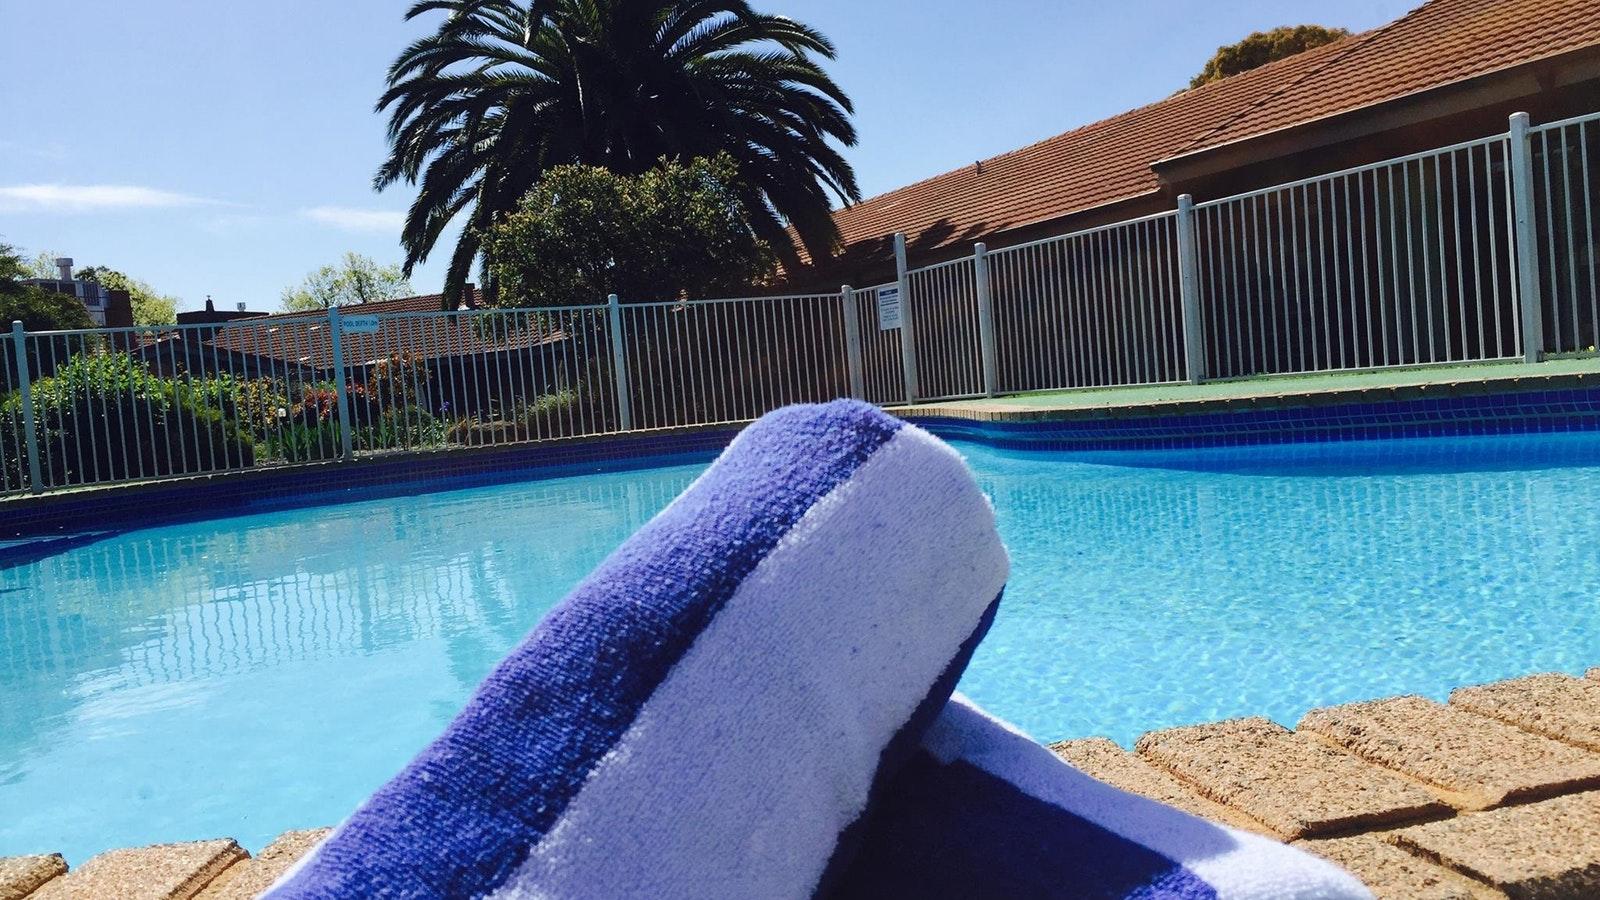 JA Pool with Towels